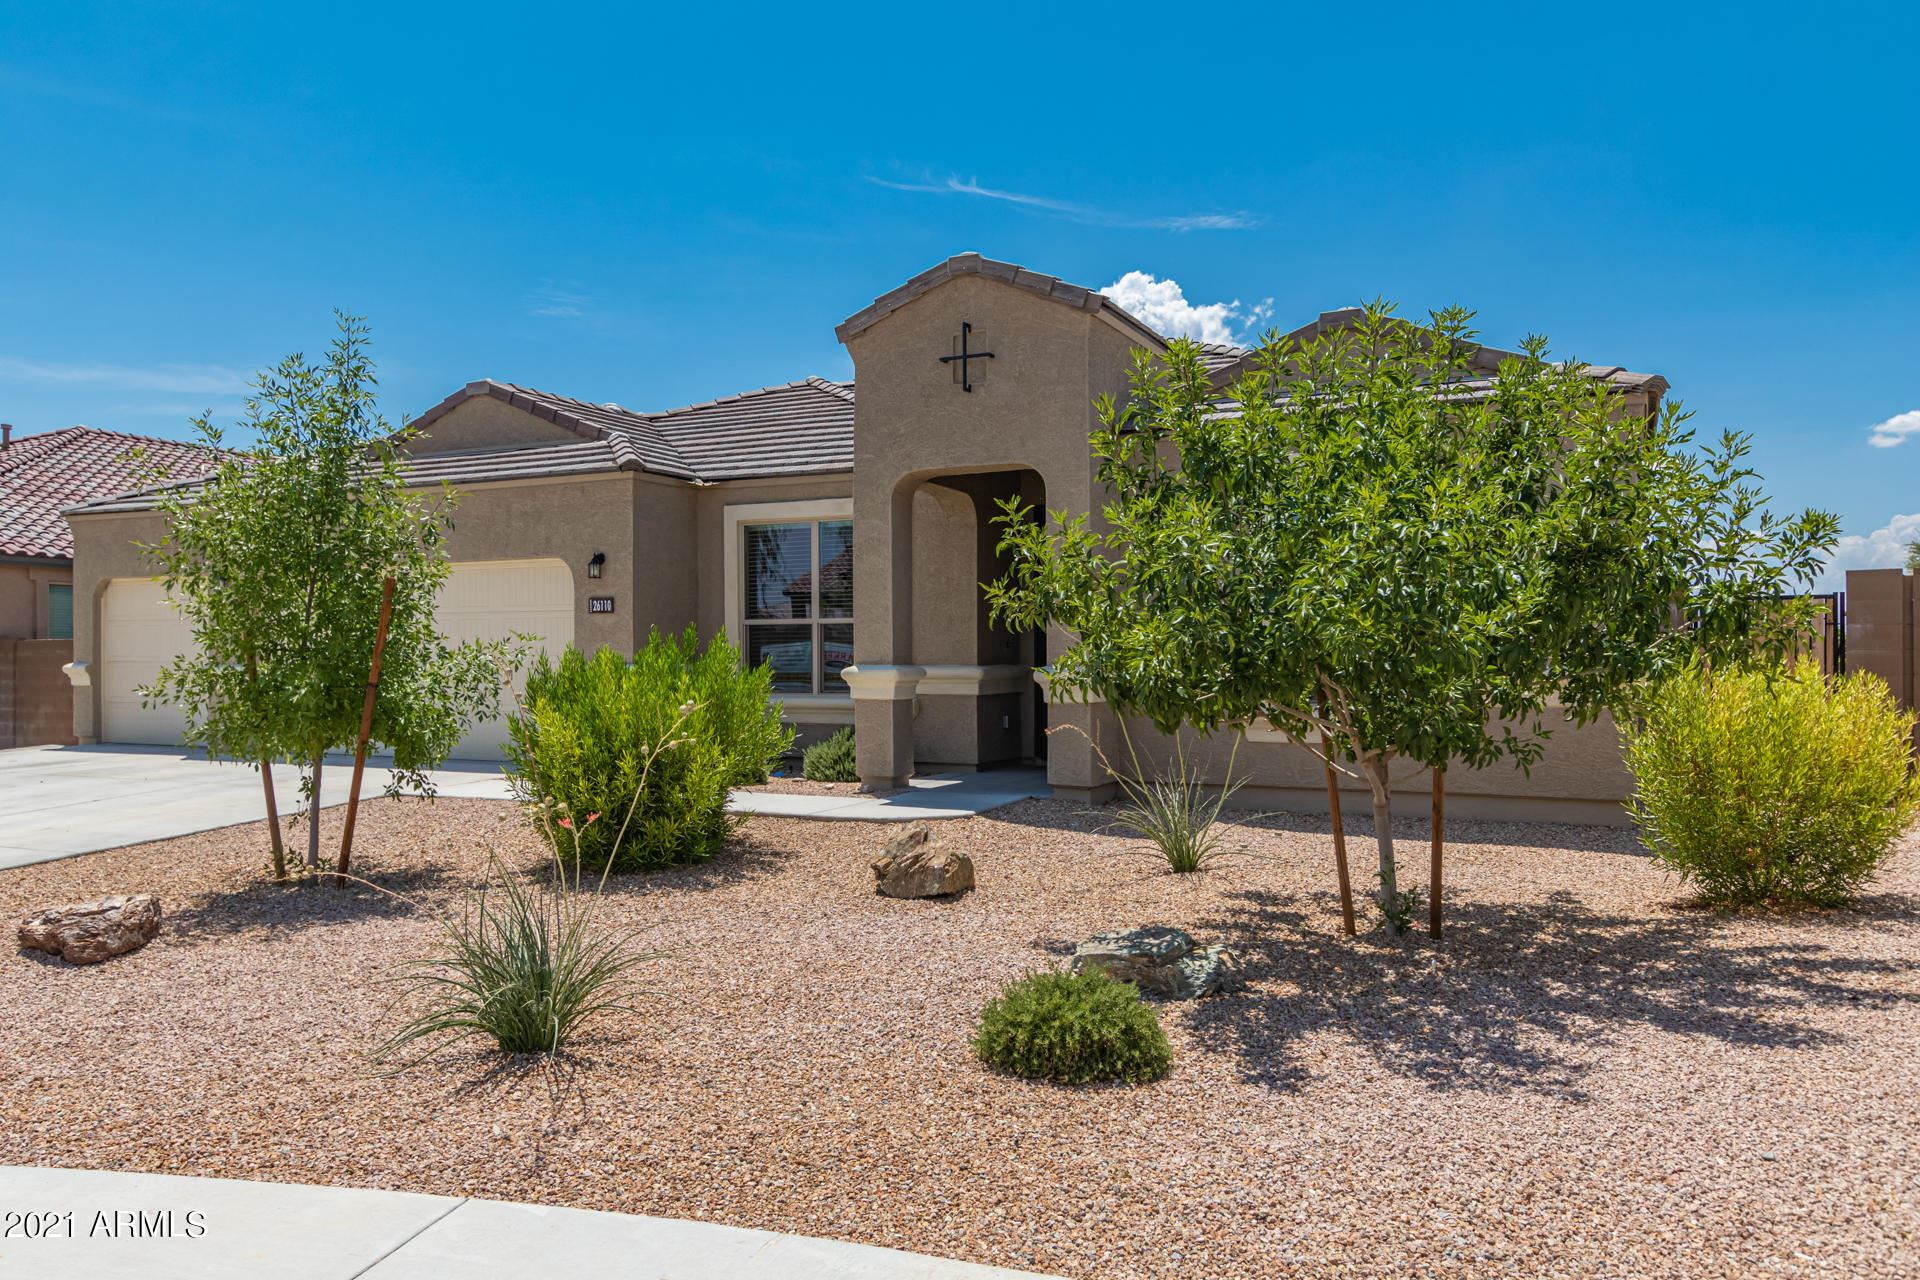 Photo of 26110 N 138TH Lane, Peoria, AZ 85383 (MLS # 6268623)